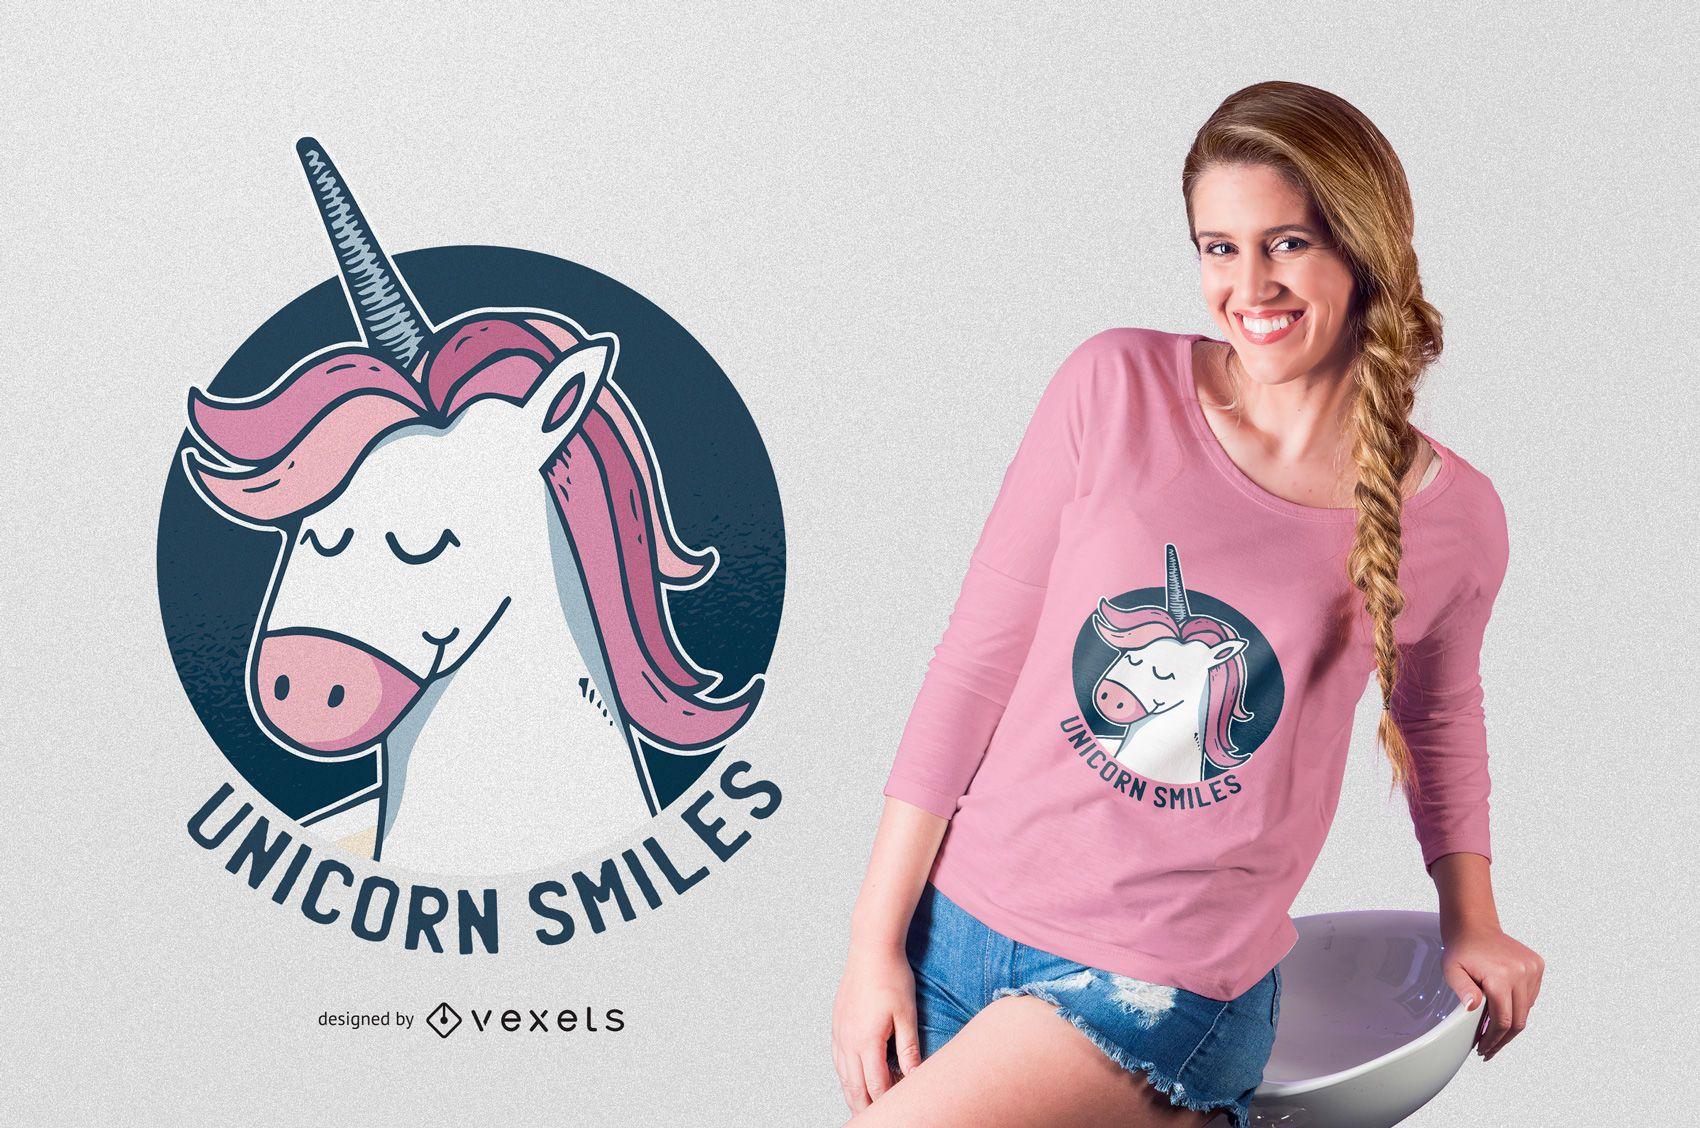 Unicorn Smile T-shirt Design - Vector download